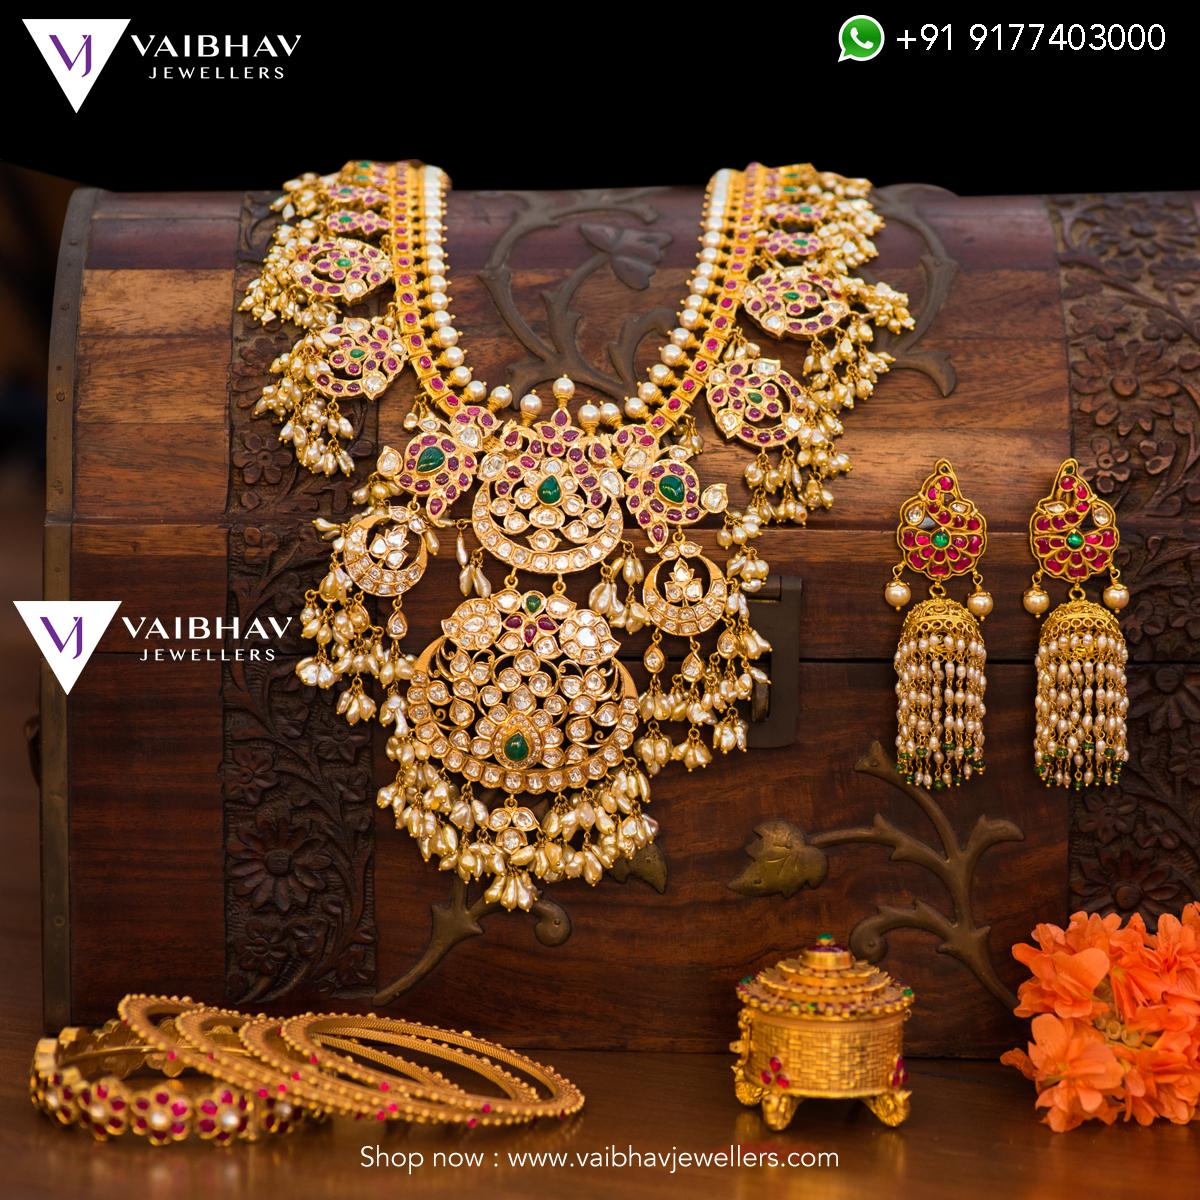 Decorative Diamond Mango Haram From Vaibhav Jewellers